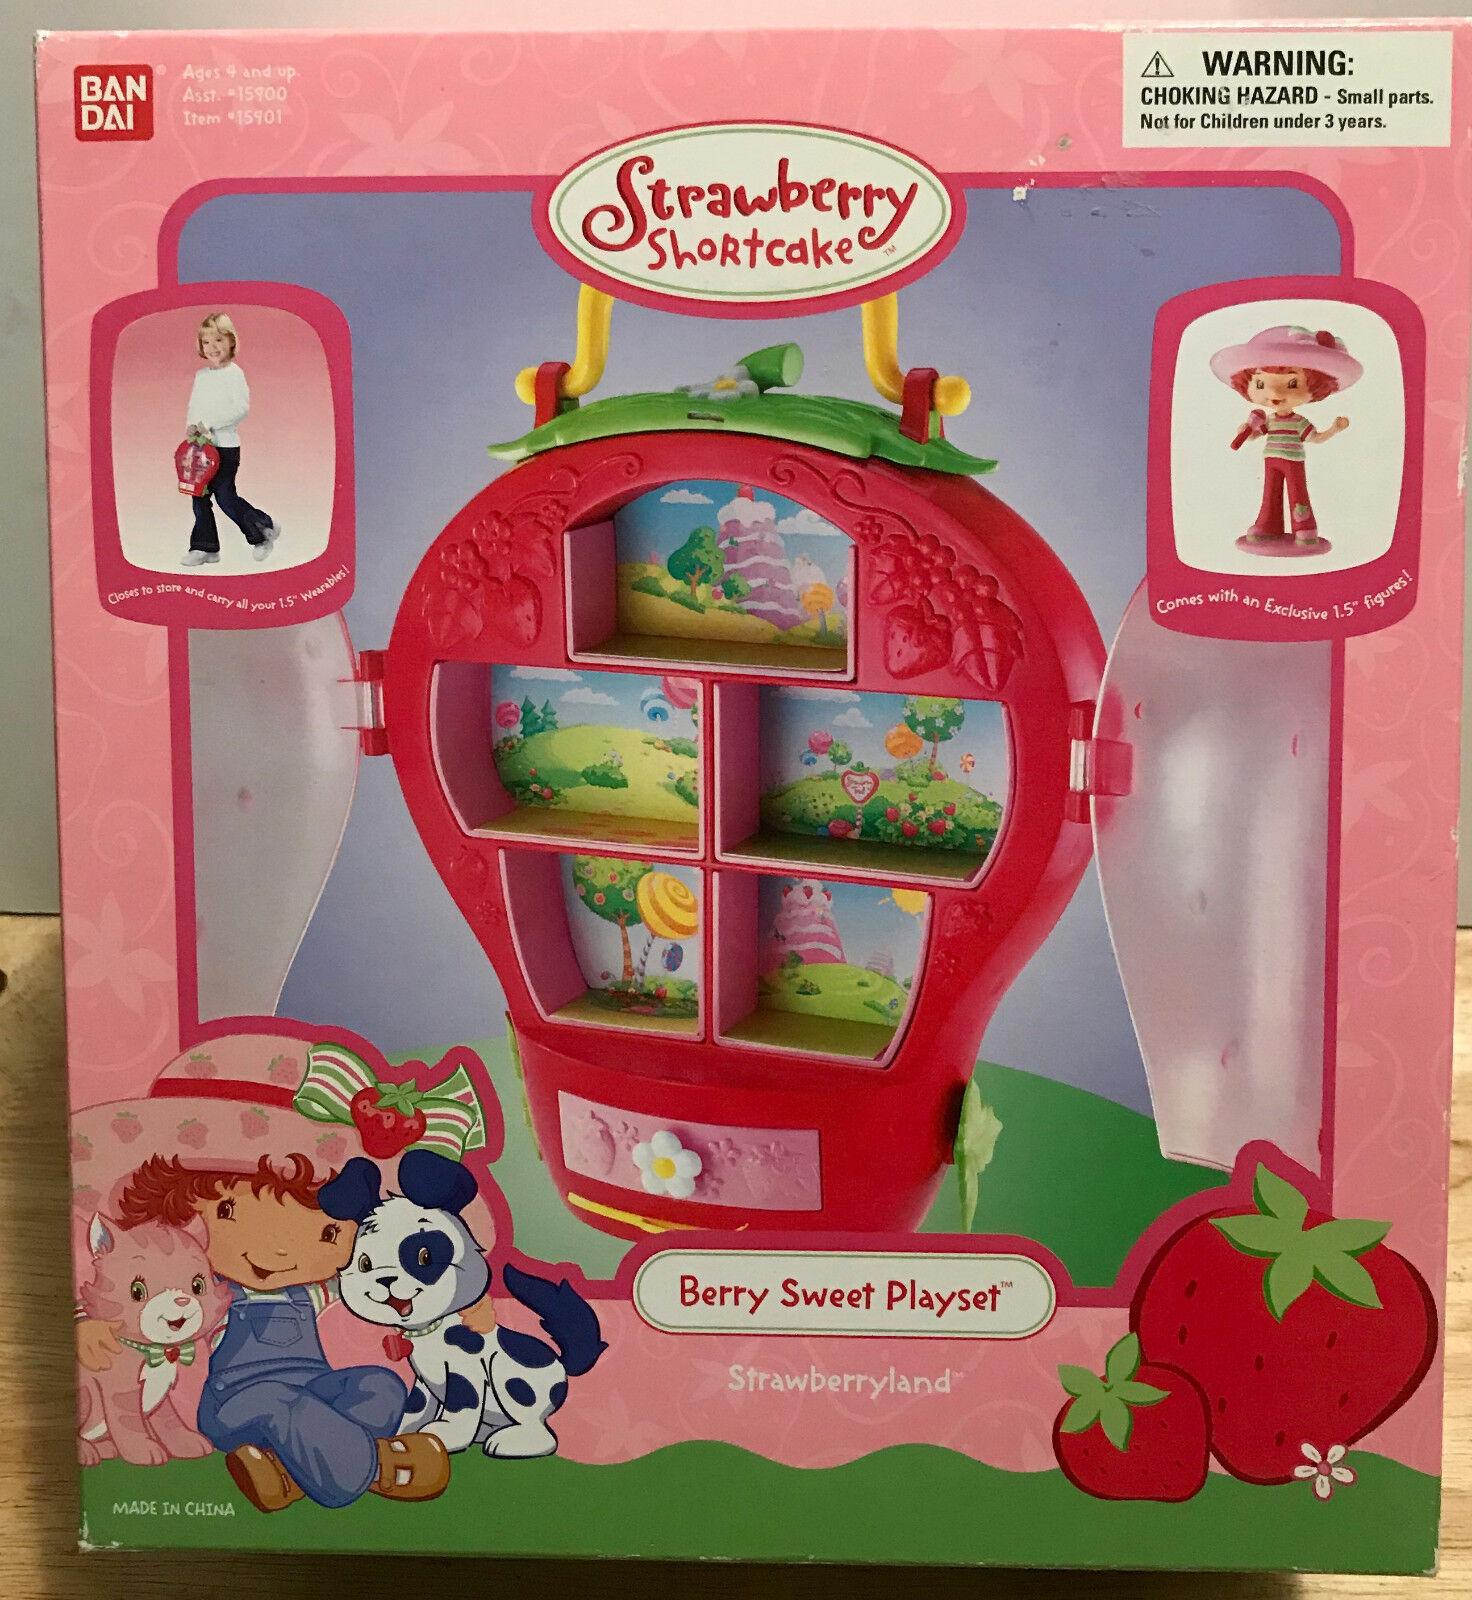 Strawberry Shortcake Berry Sweet Sweet Sweet Playhouse 2004 NEW  AGES 4+ BAN DAI 8b851b